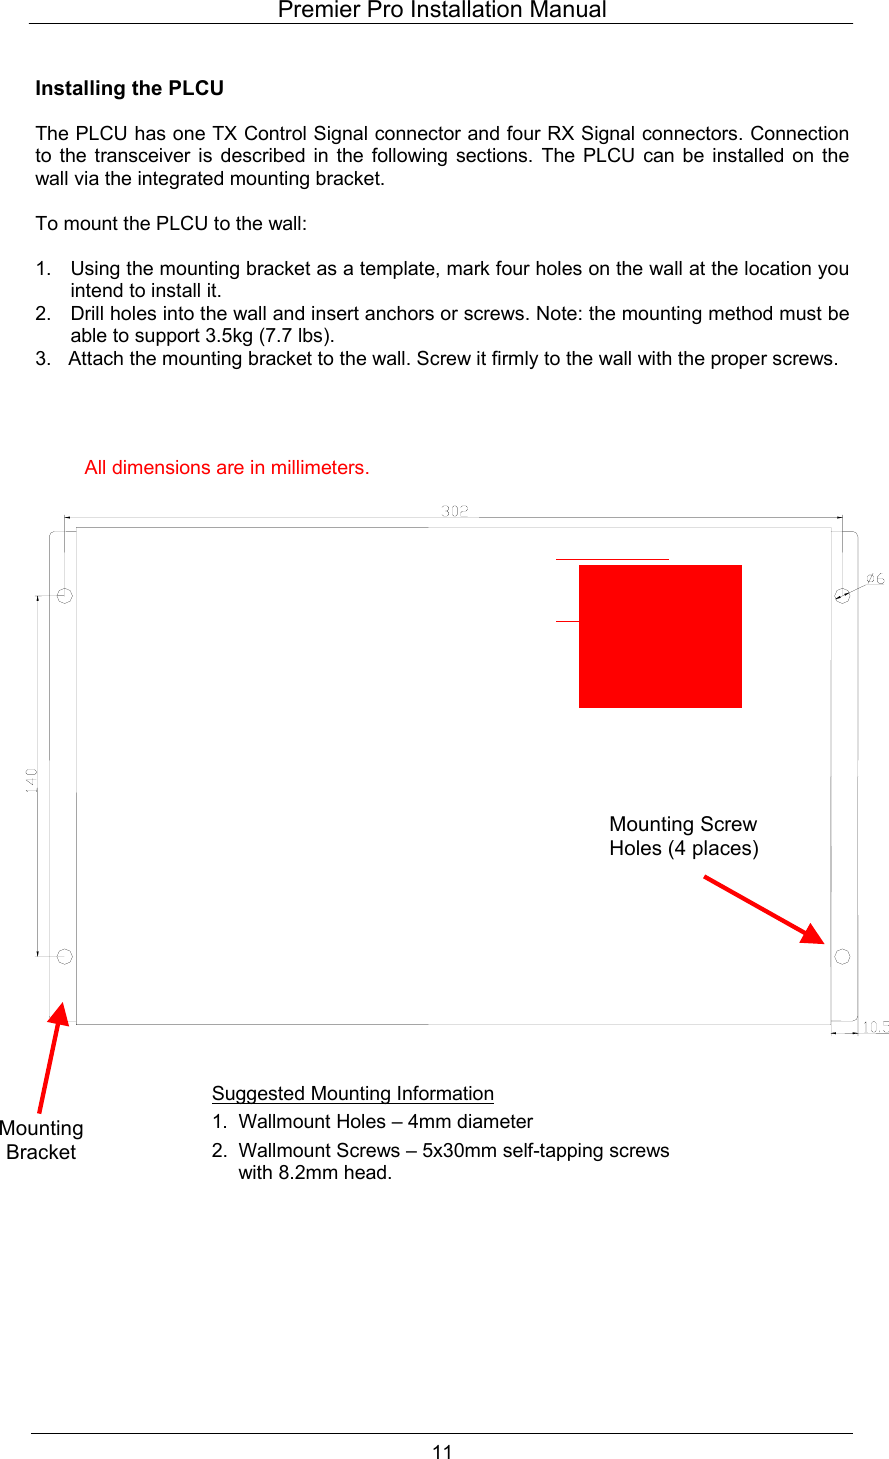 image pro premier user manual